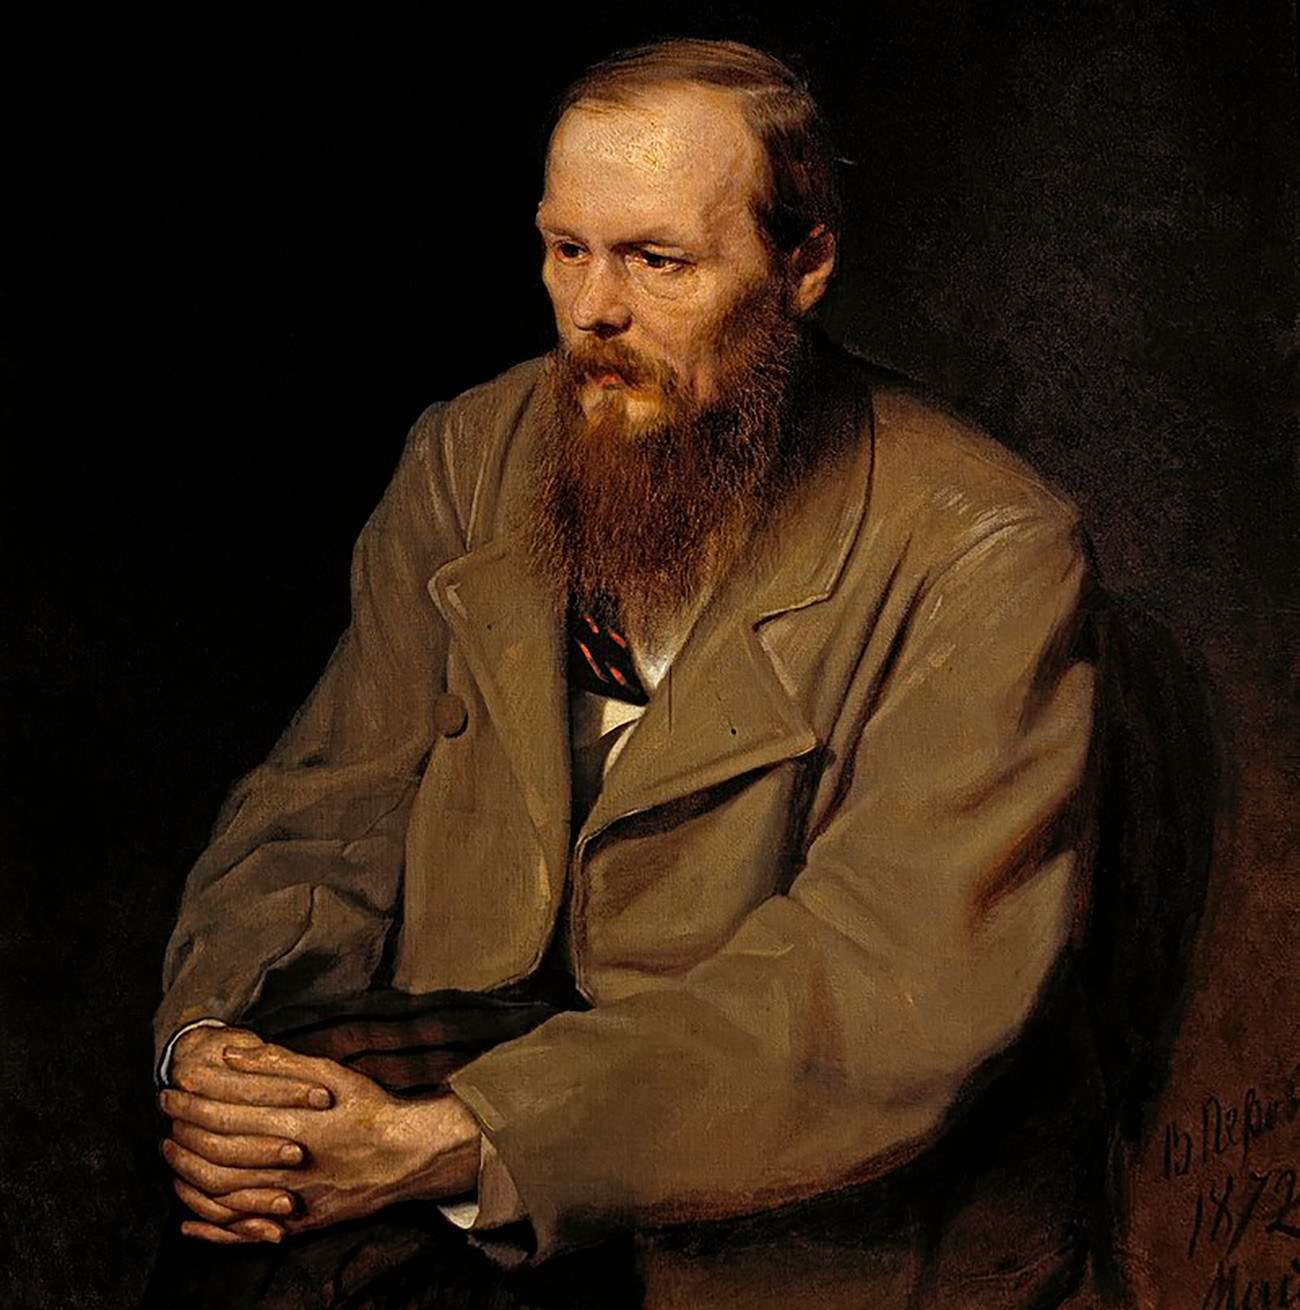 Fjodor Dostojevski, prvak ruskega trpljenja.